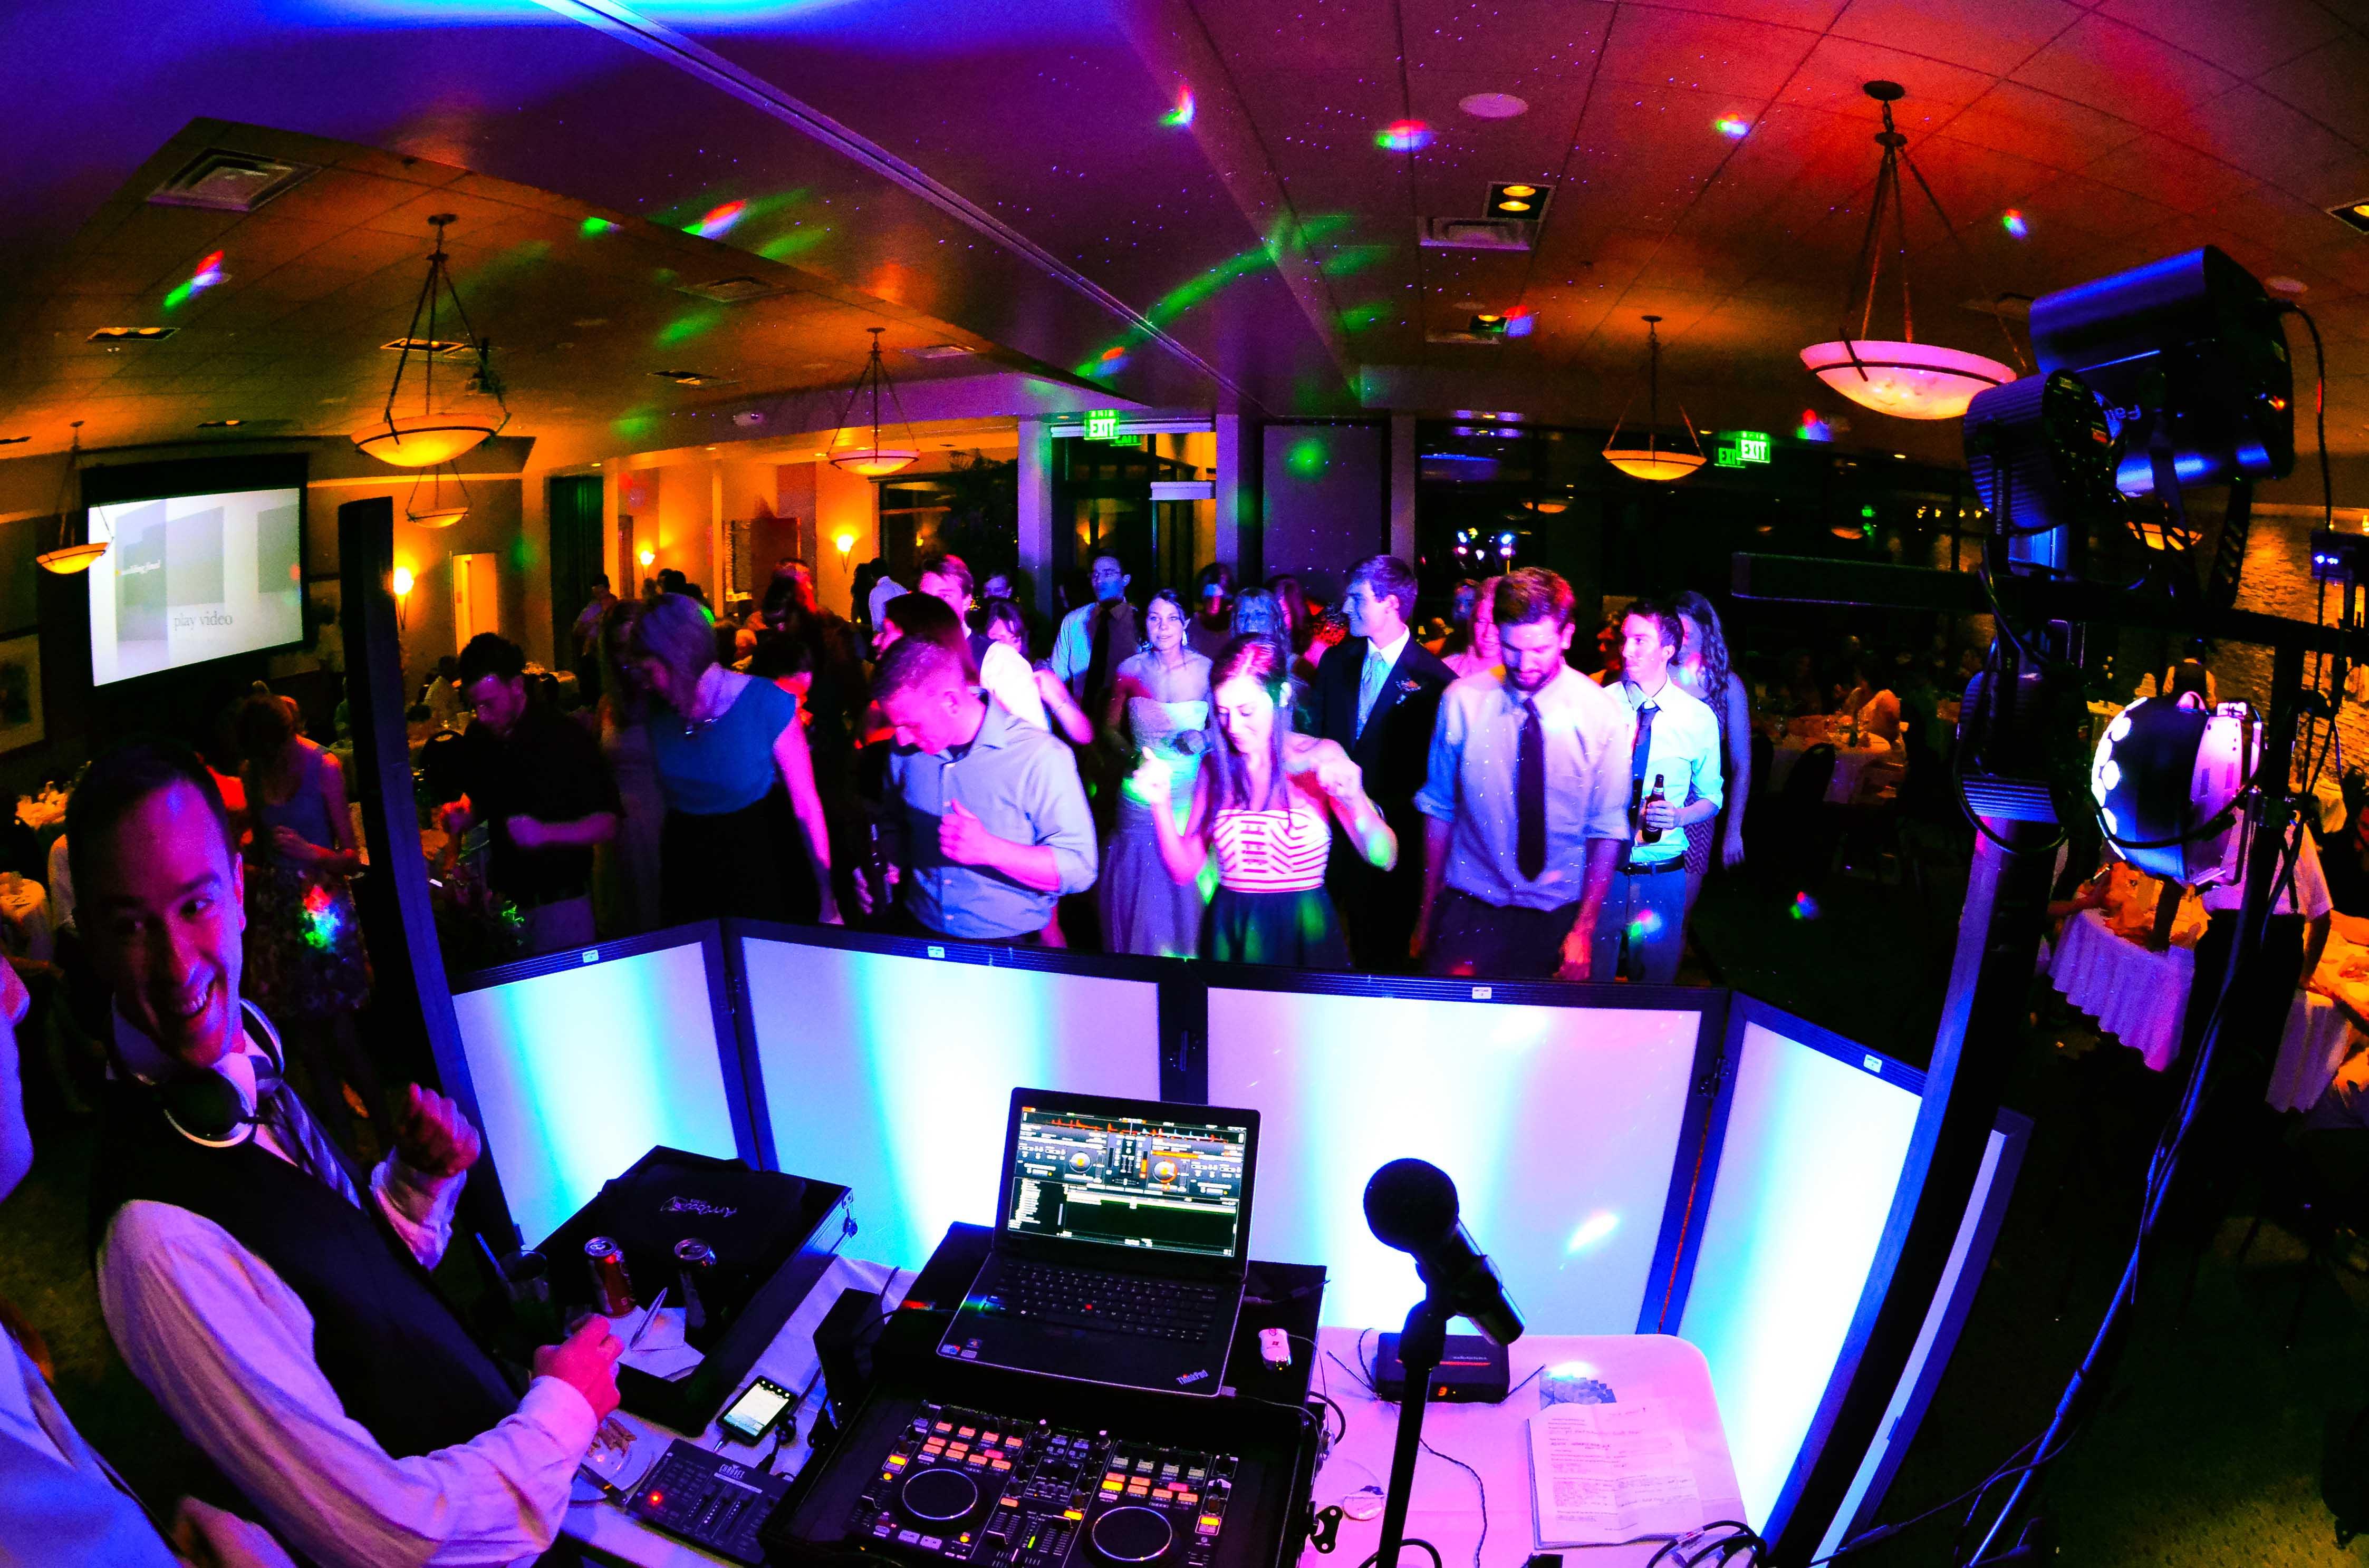 Mobile disco mobile dj wedding dj hire findit party dj soundofmusicmobiledisco party djs junglespirit Choice Image